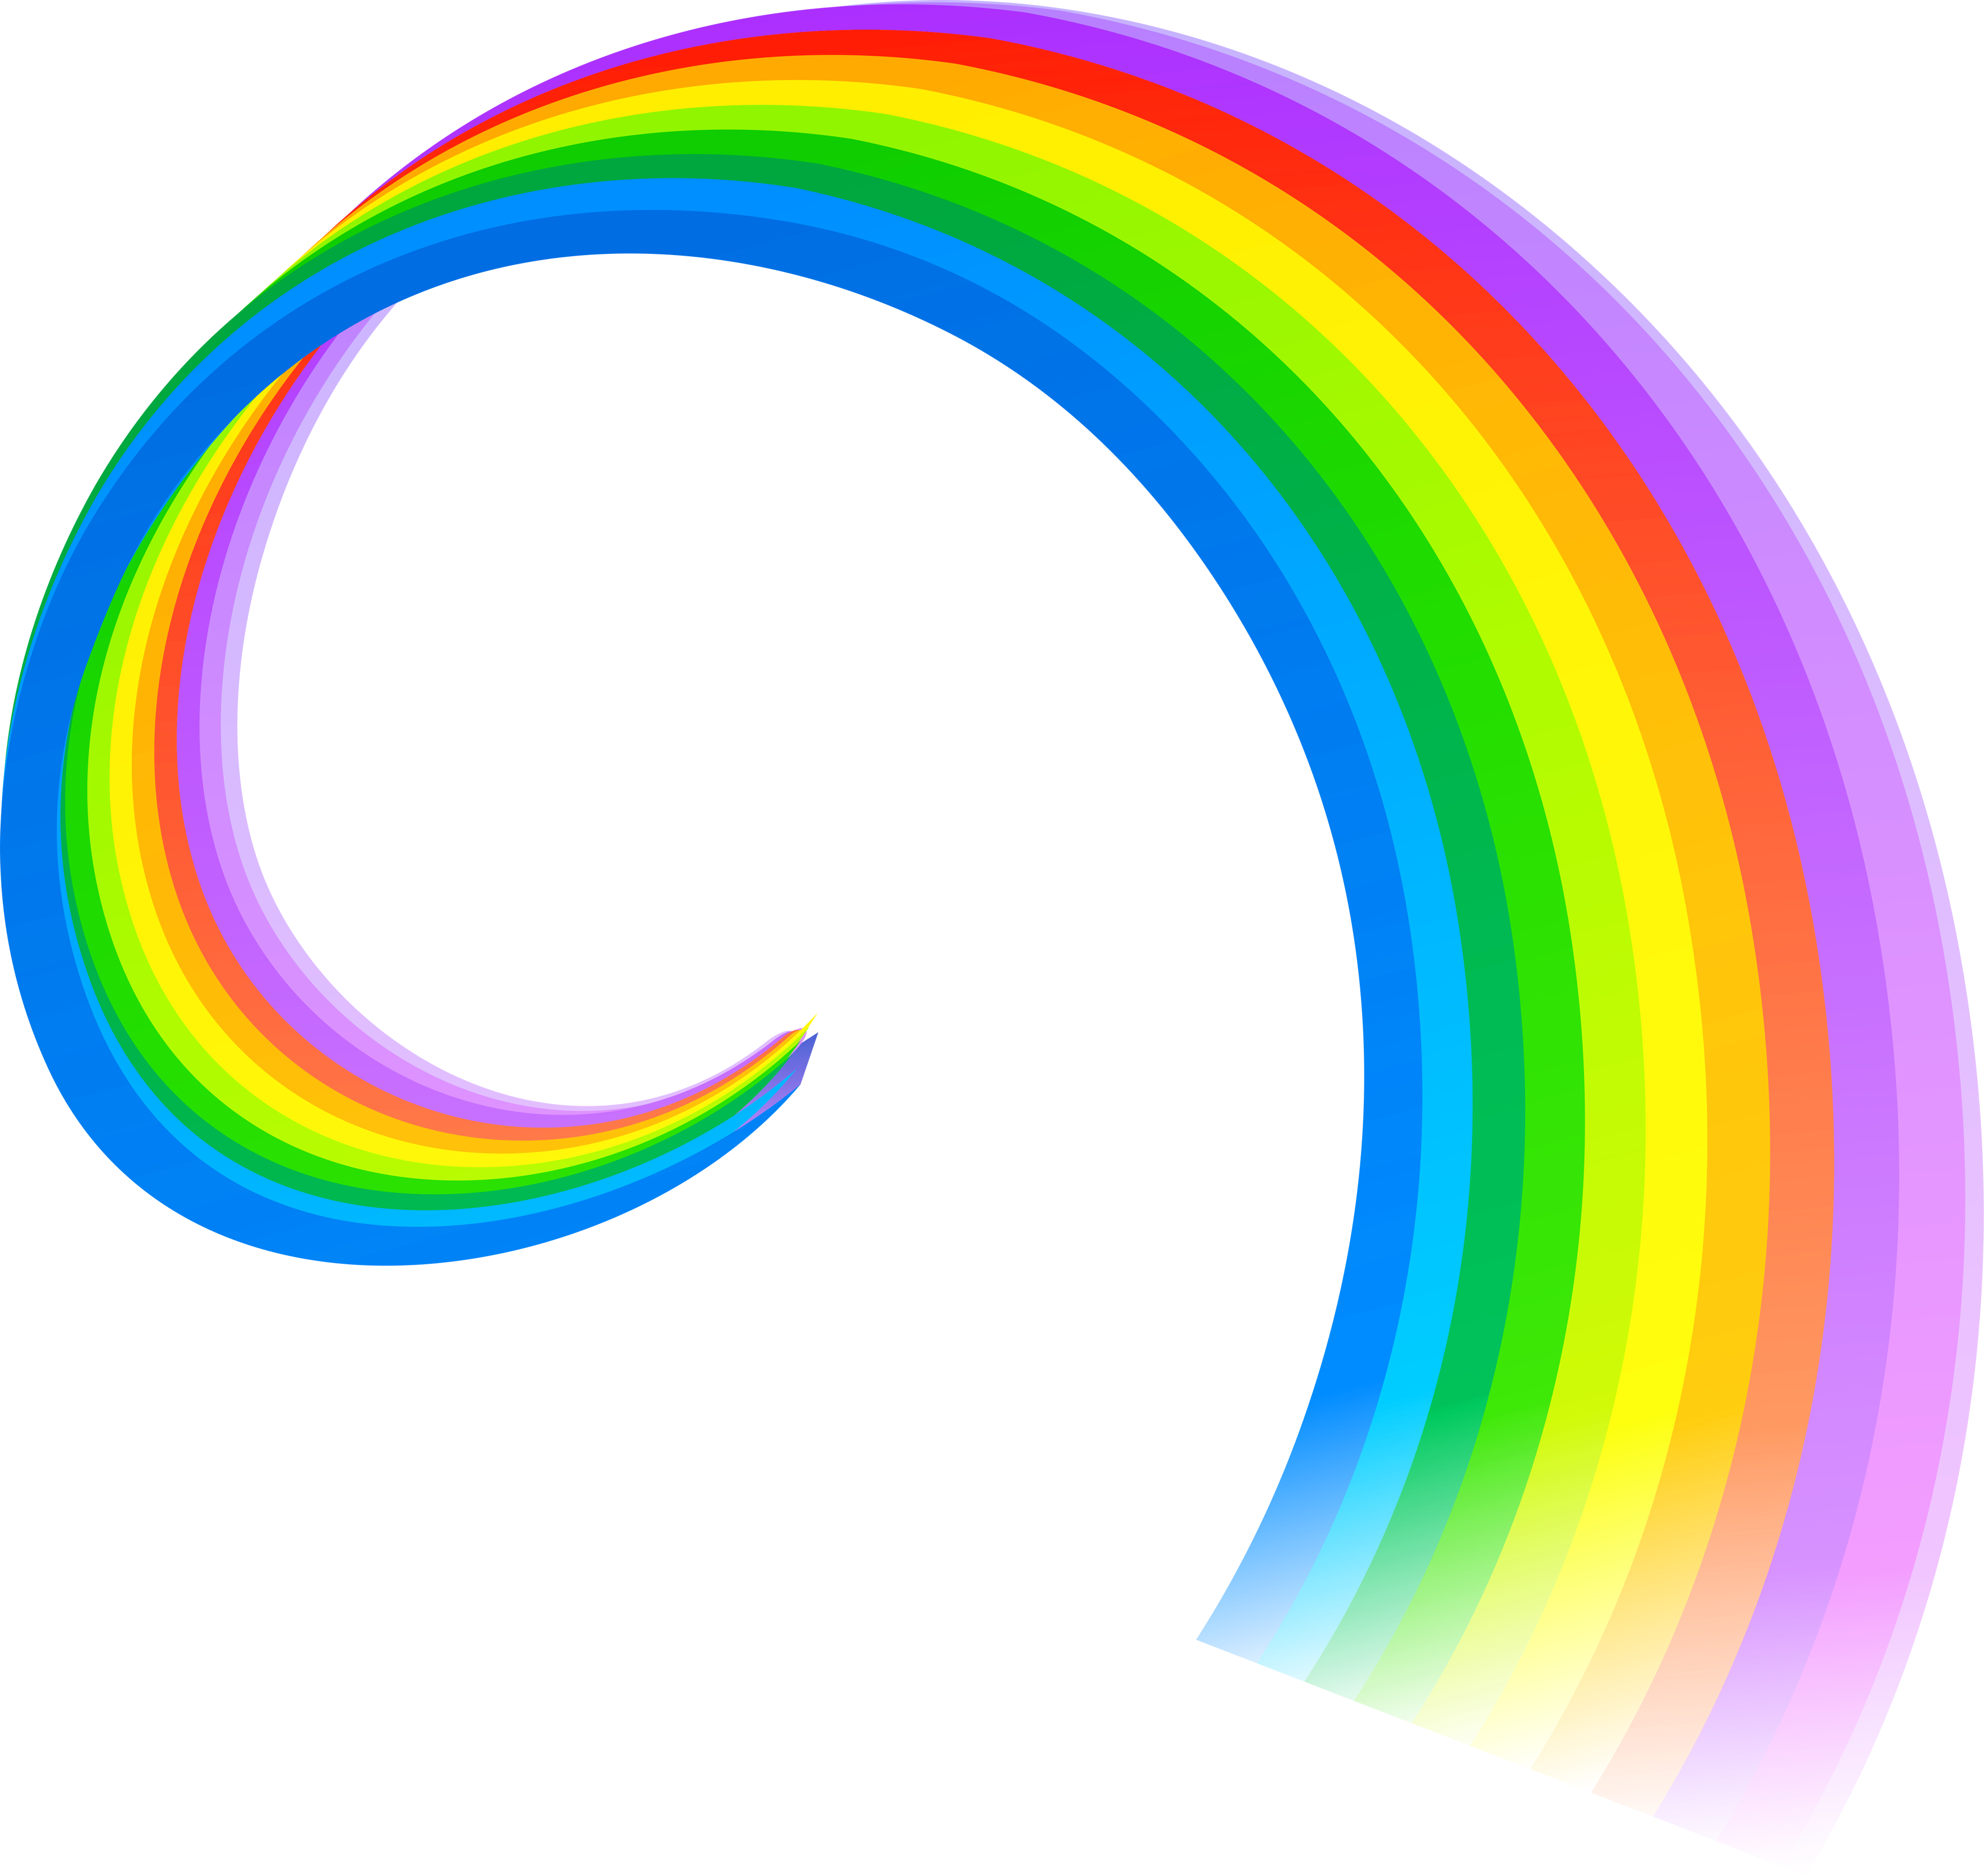 Rainbow HD PNG - 90661